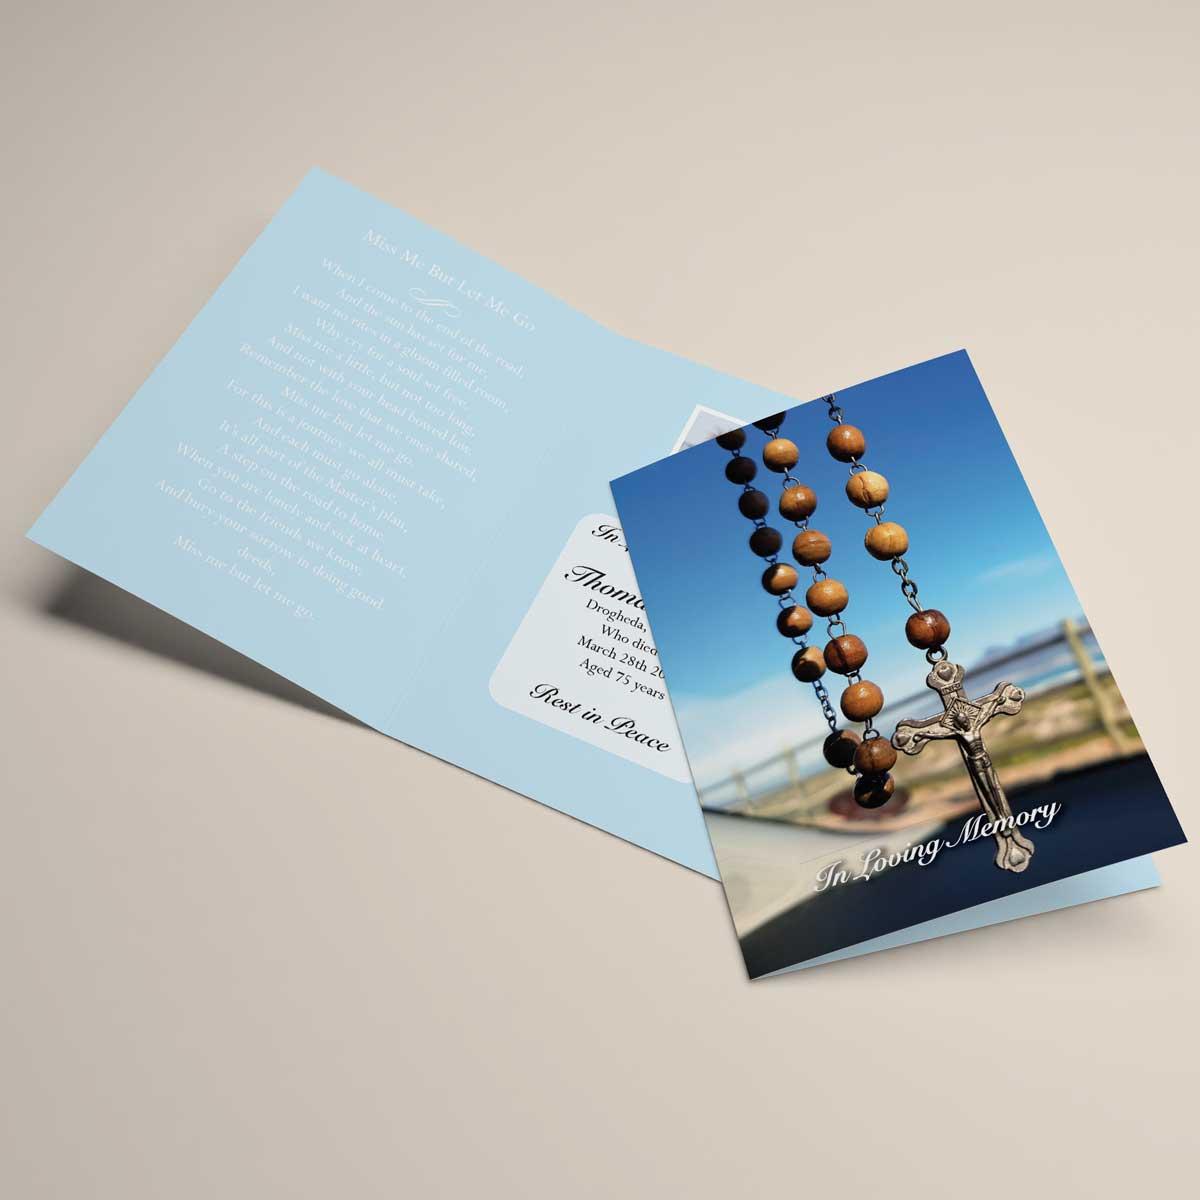 Religious inspired memorial card design - crucifix rosary